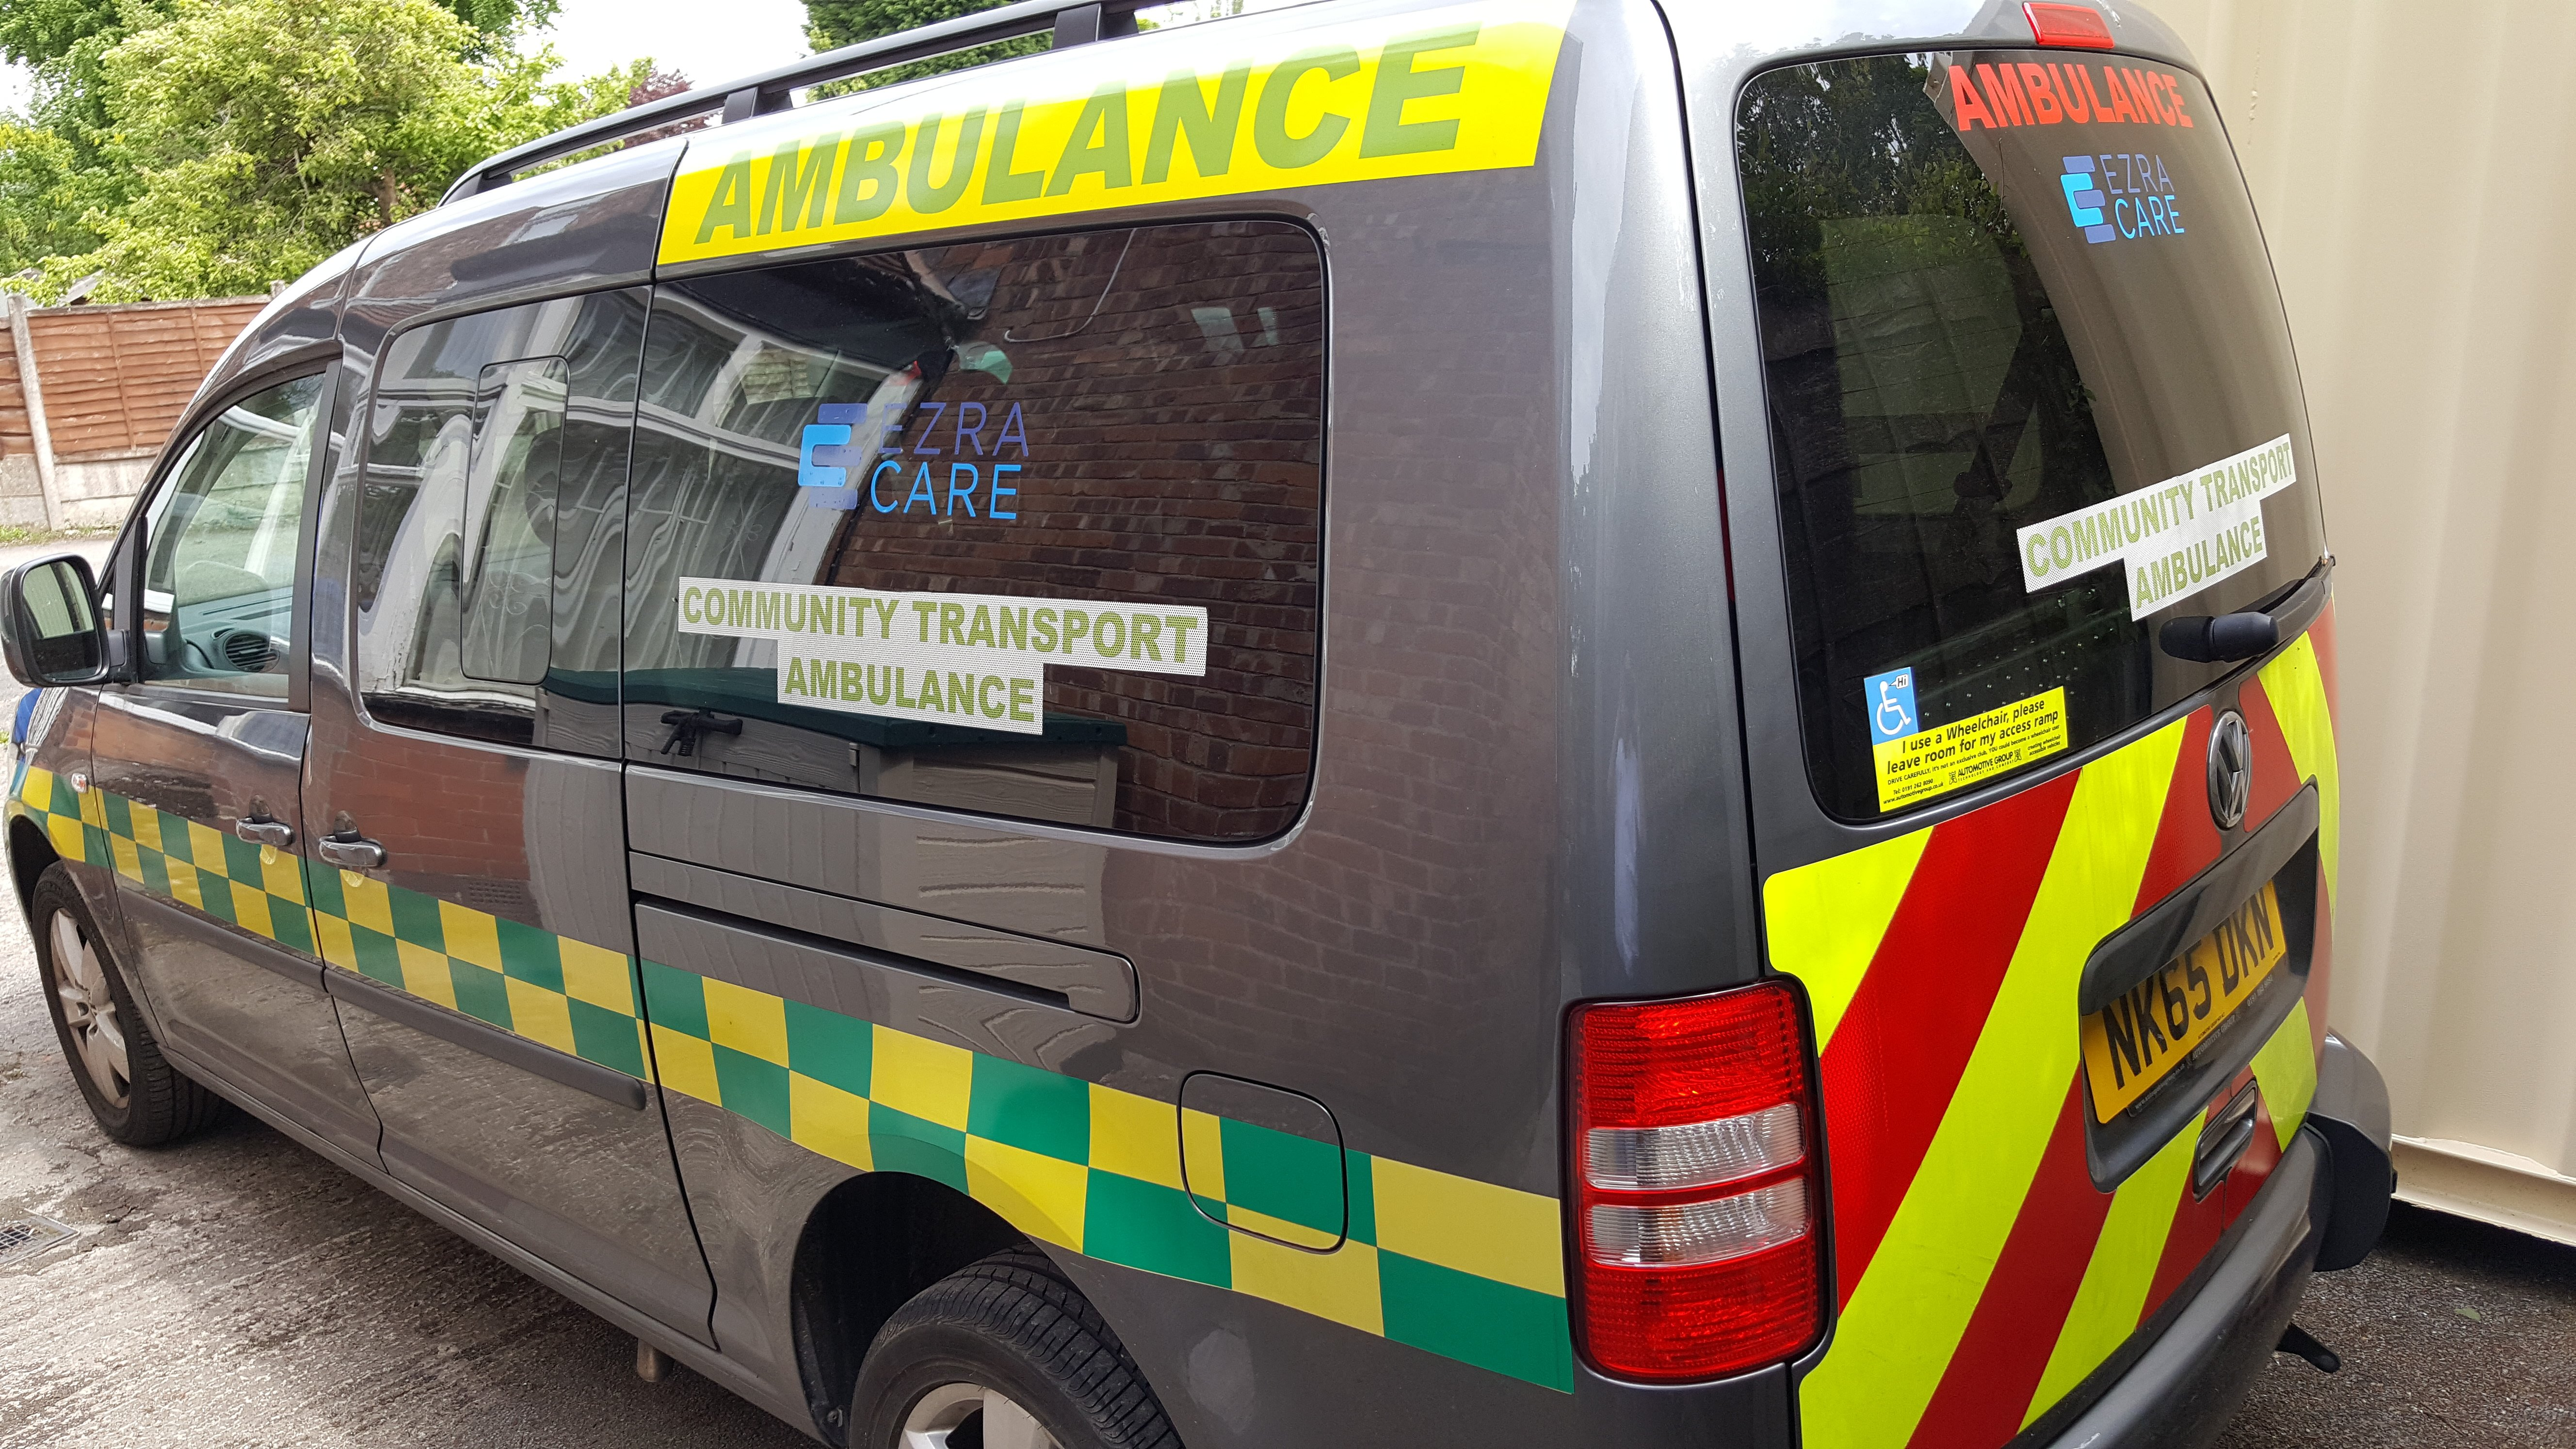 Community transport ambulance service